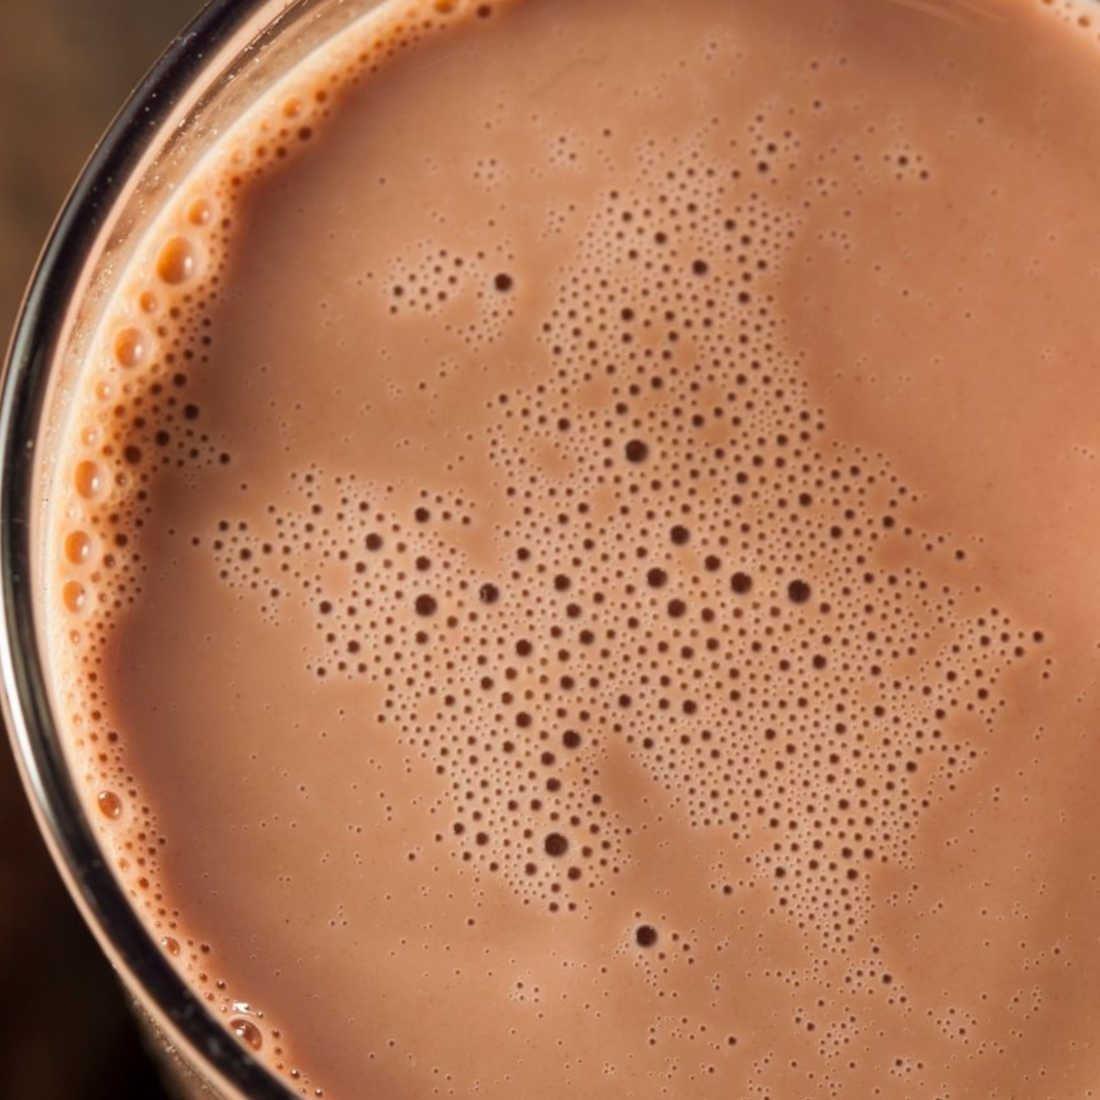 Chocolate Milk Day